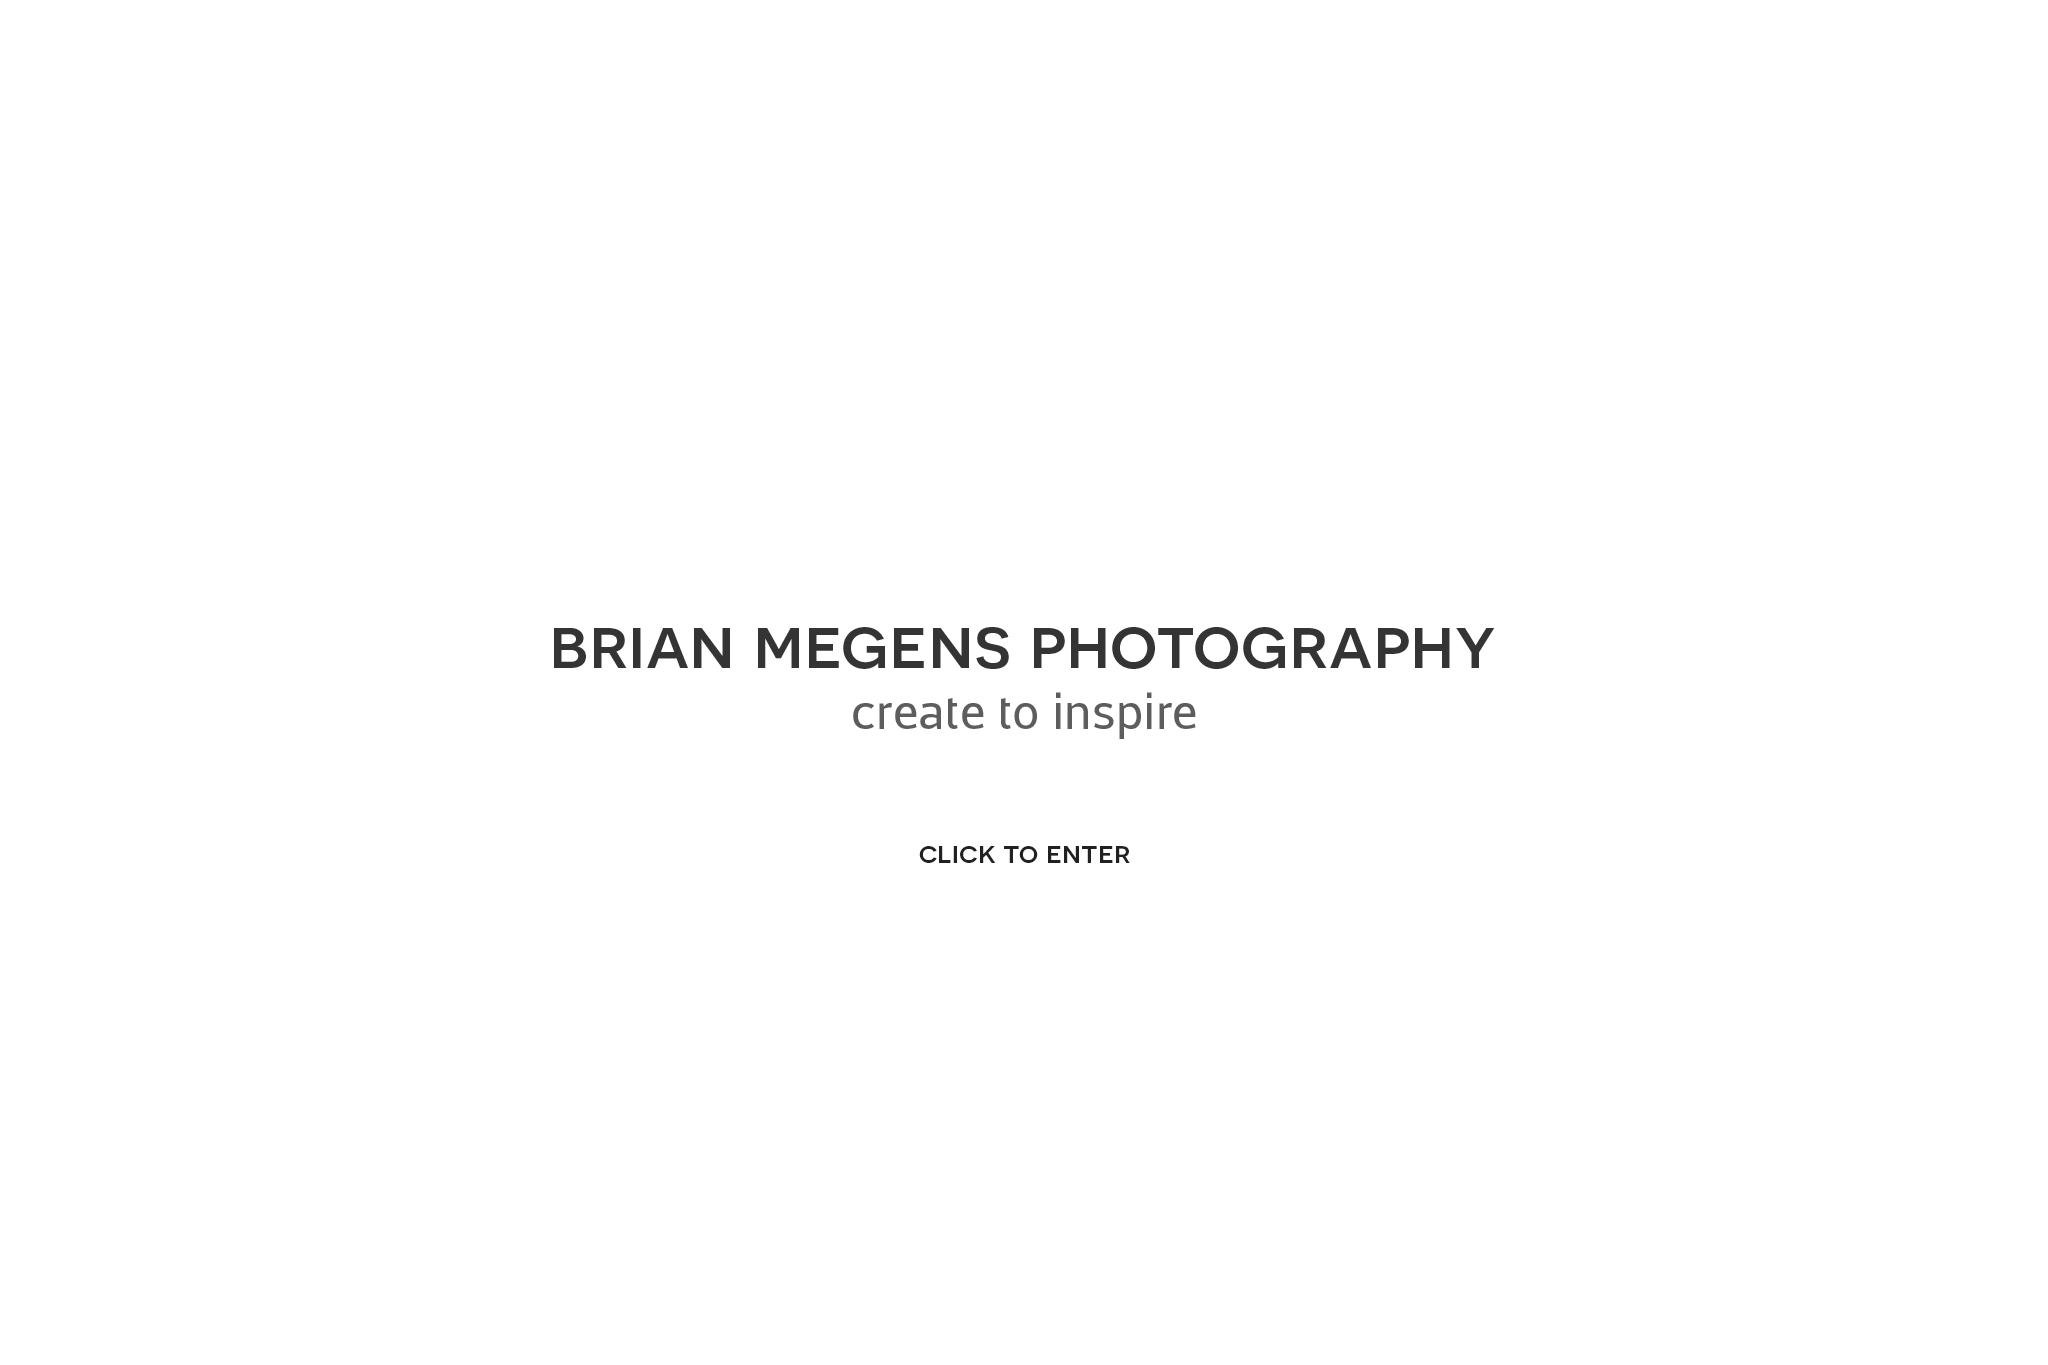 Brian Megens Photography